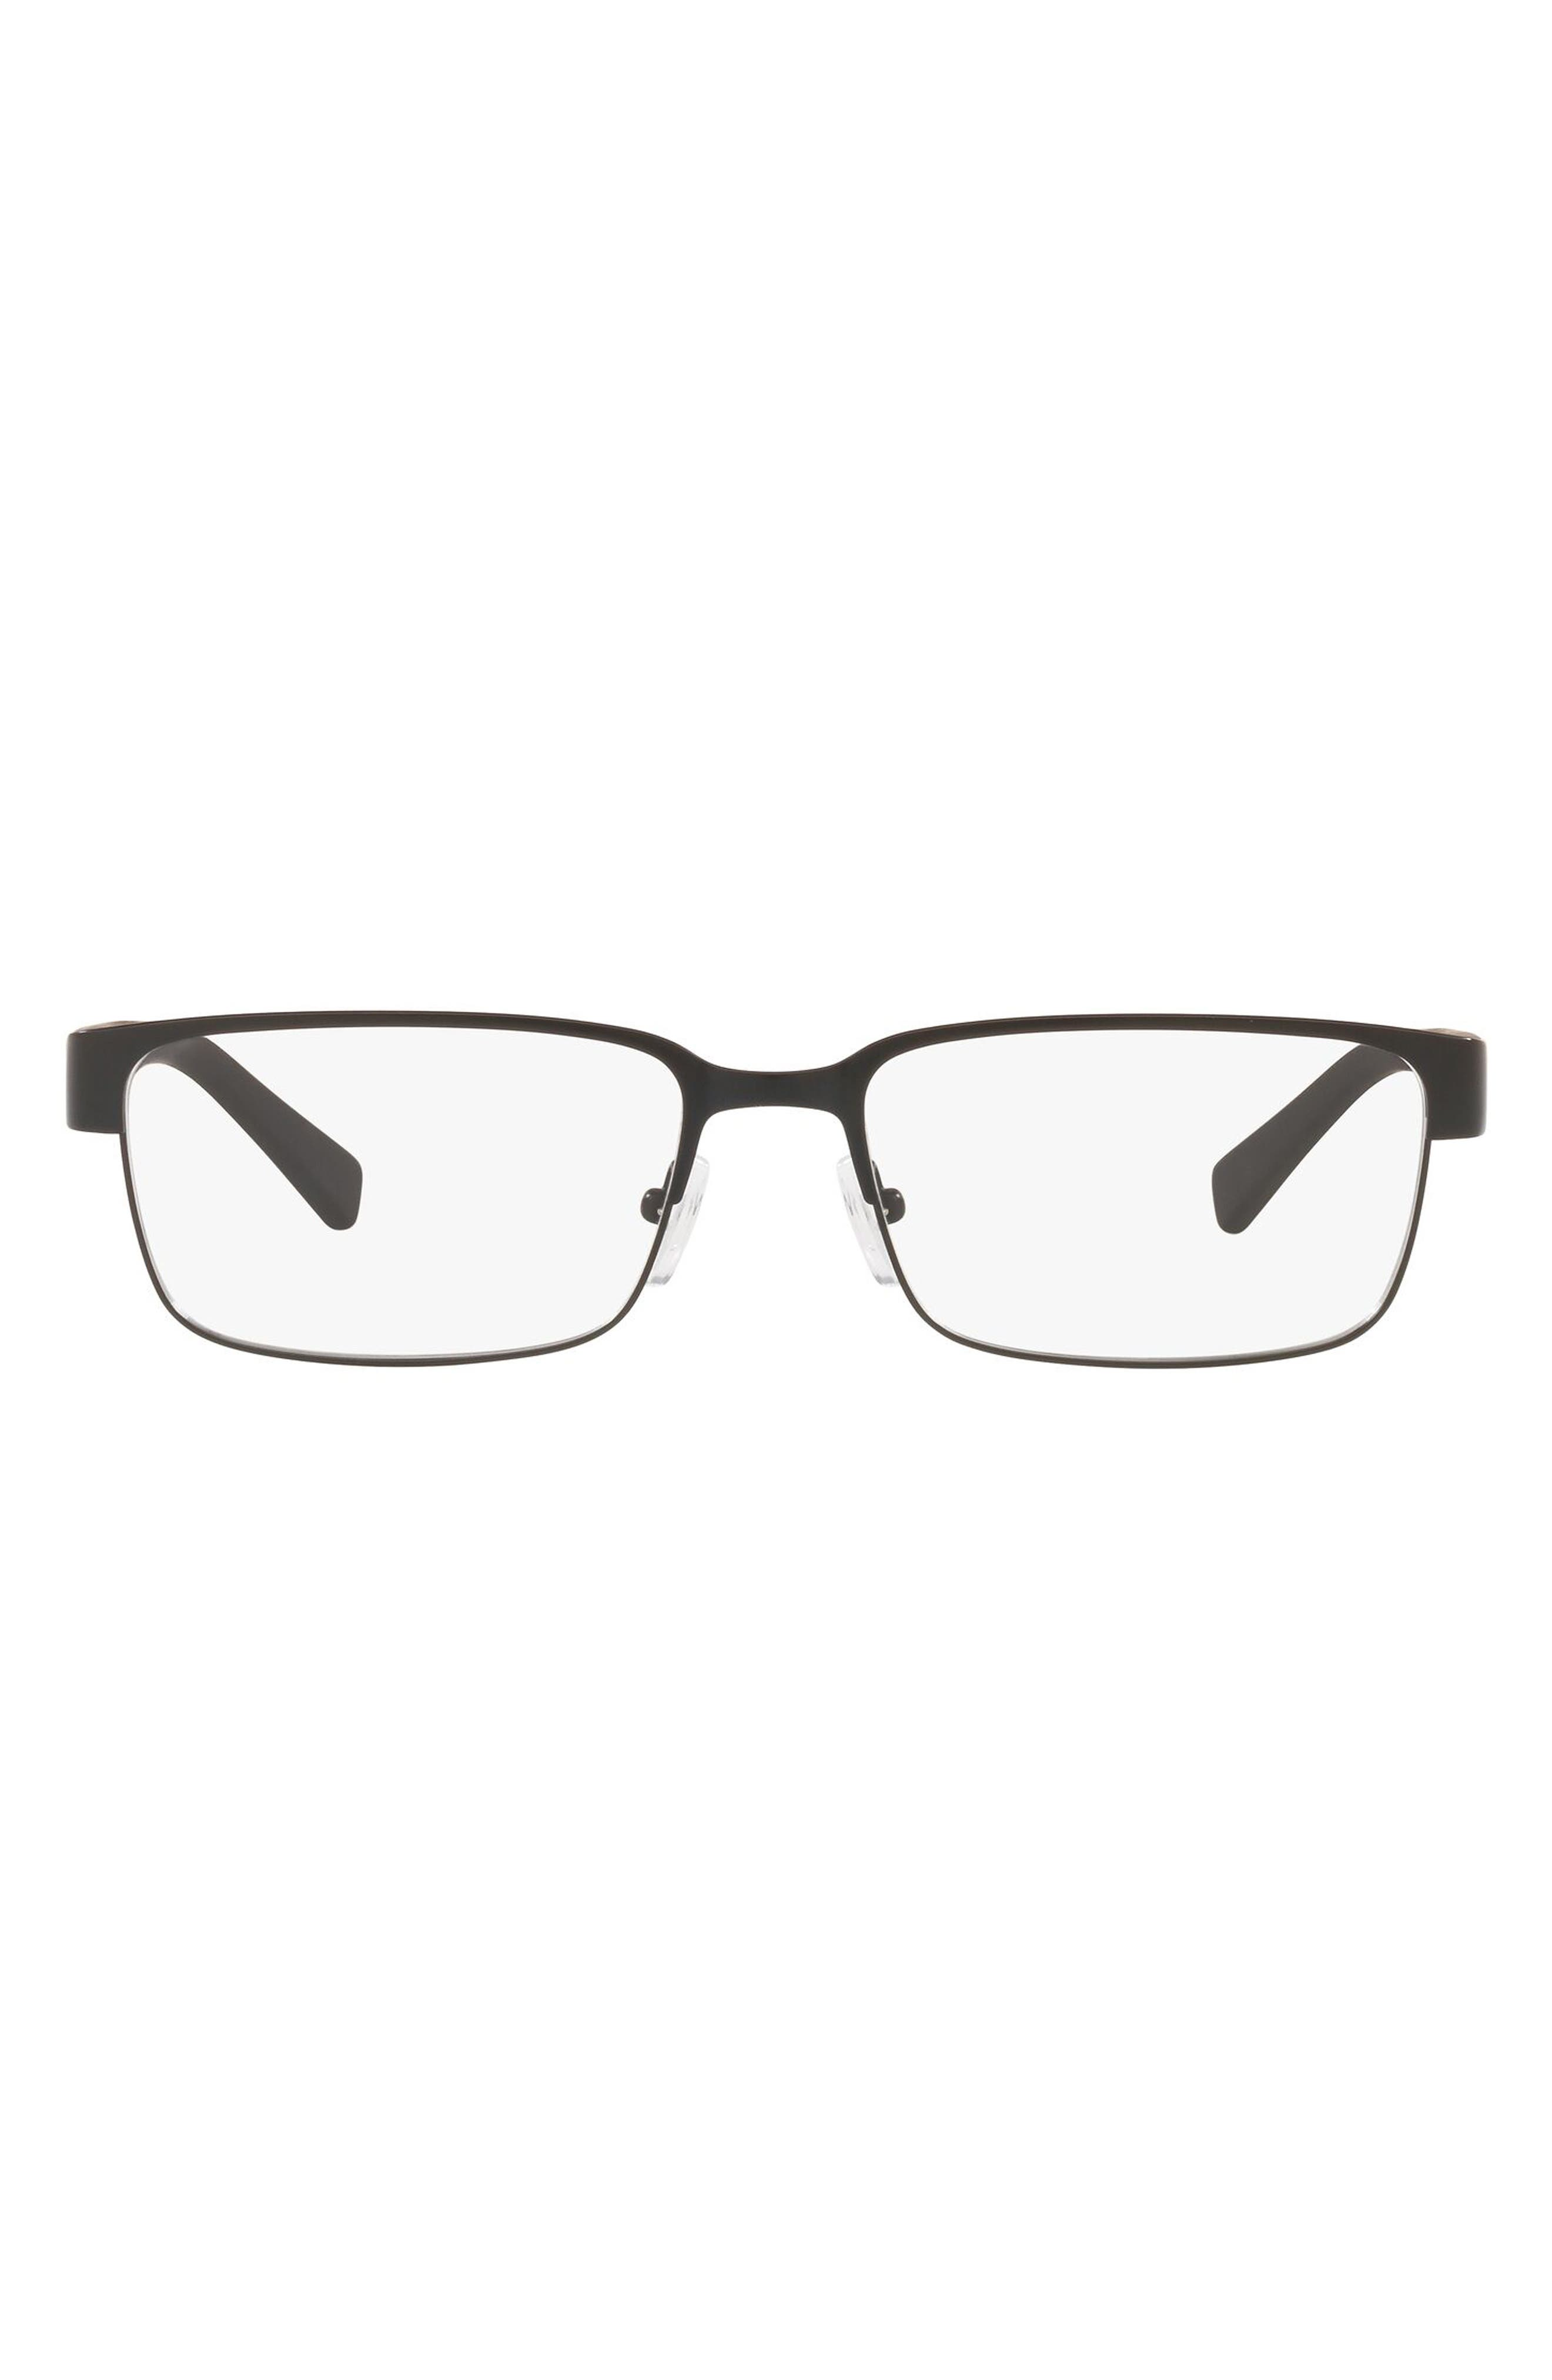 54mm Rectangular Optical Glasses